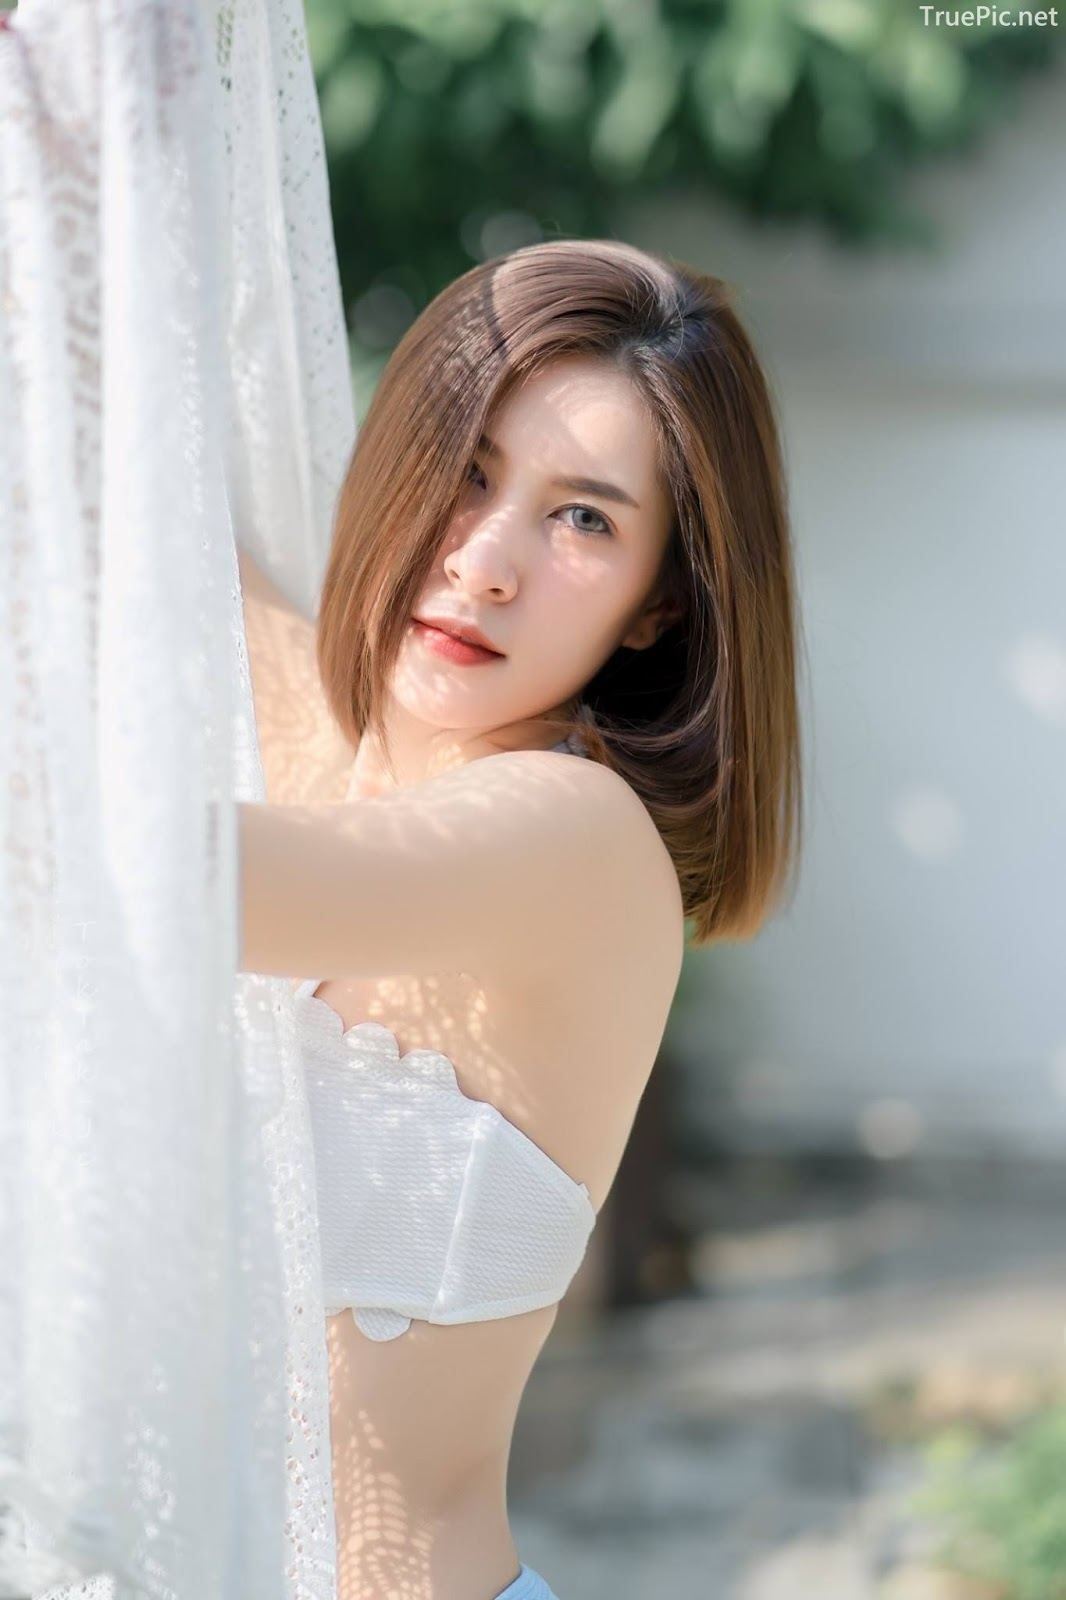 Thailand hot model MIldd Thanyarath Sriudomloert - Sexy 2 Piece Swimsuits - Picture 7